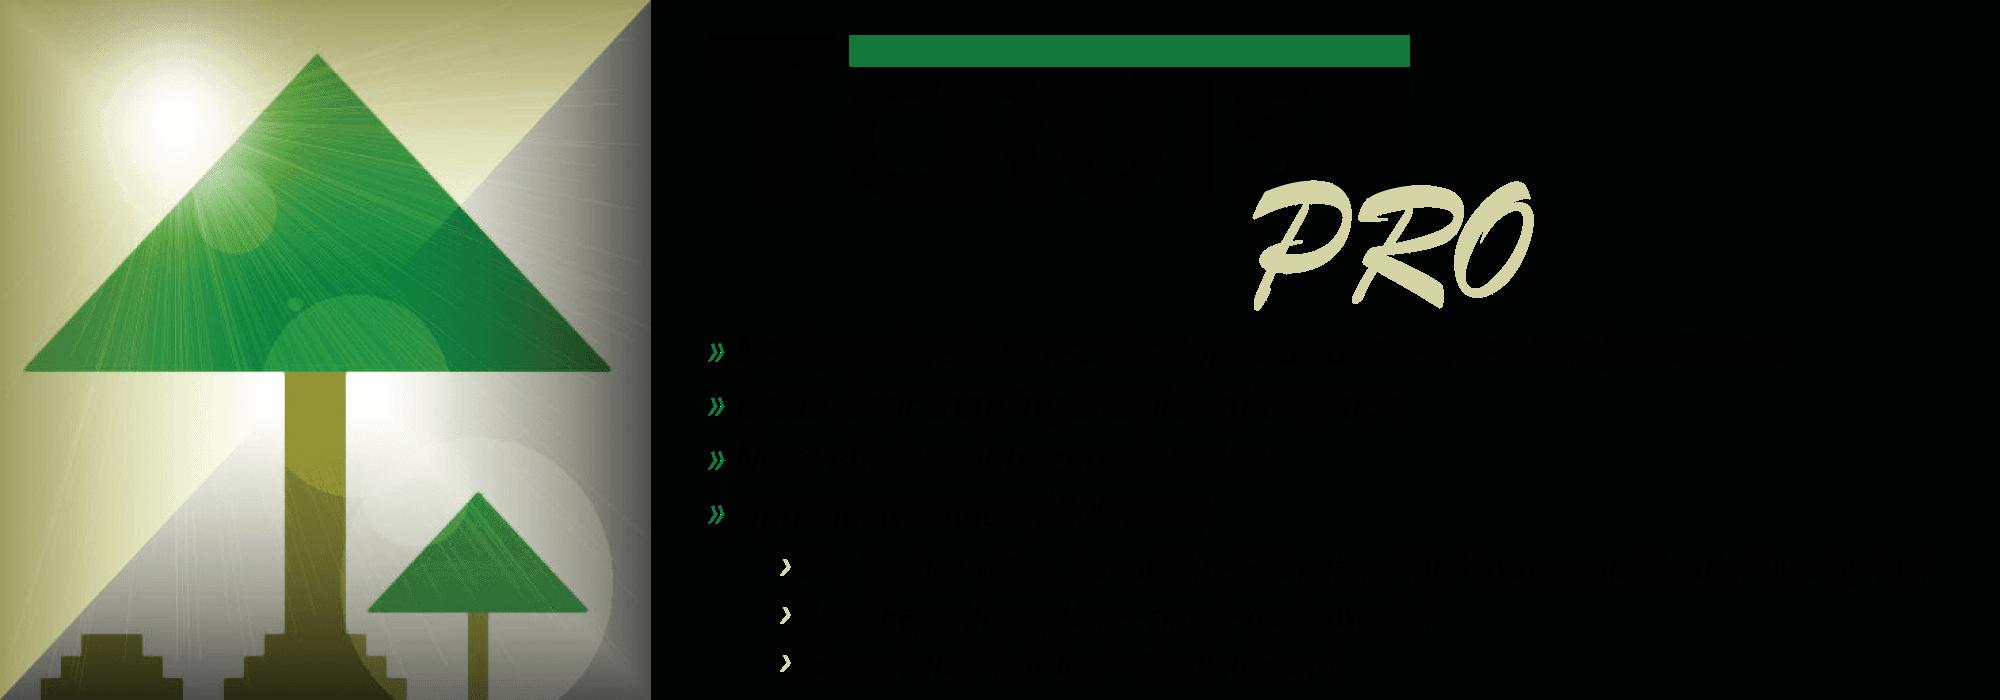 tcruise-logo